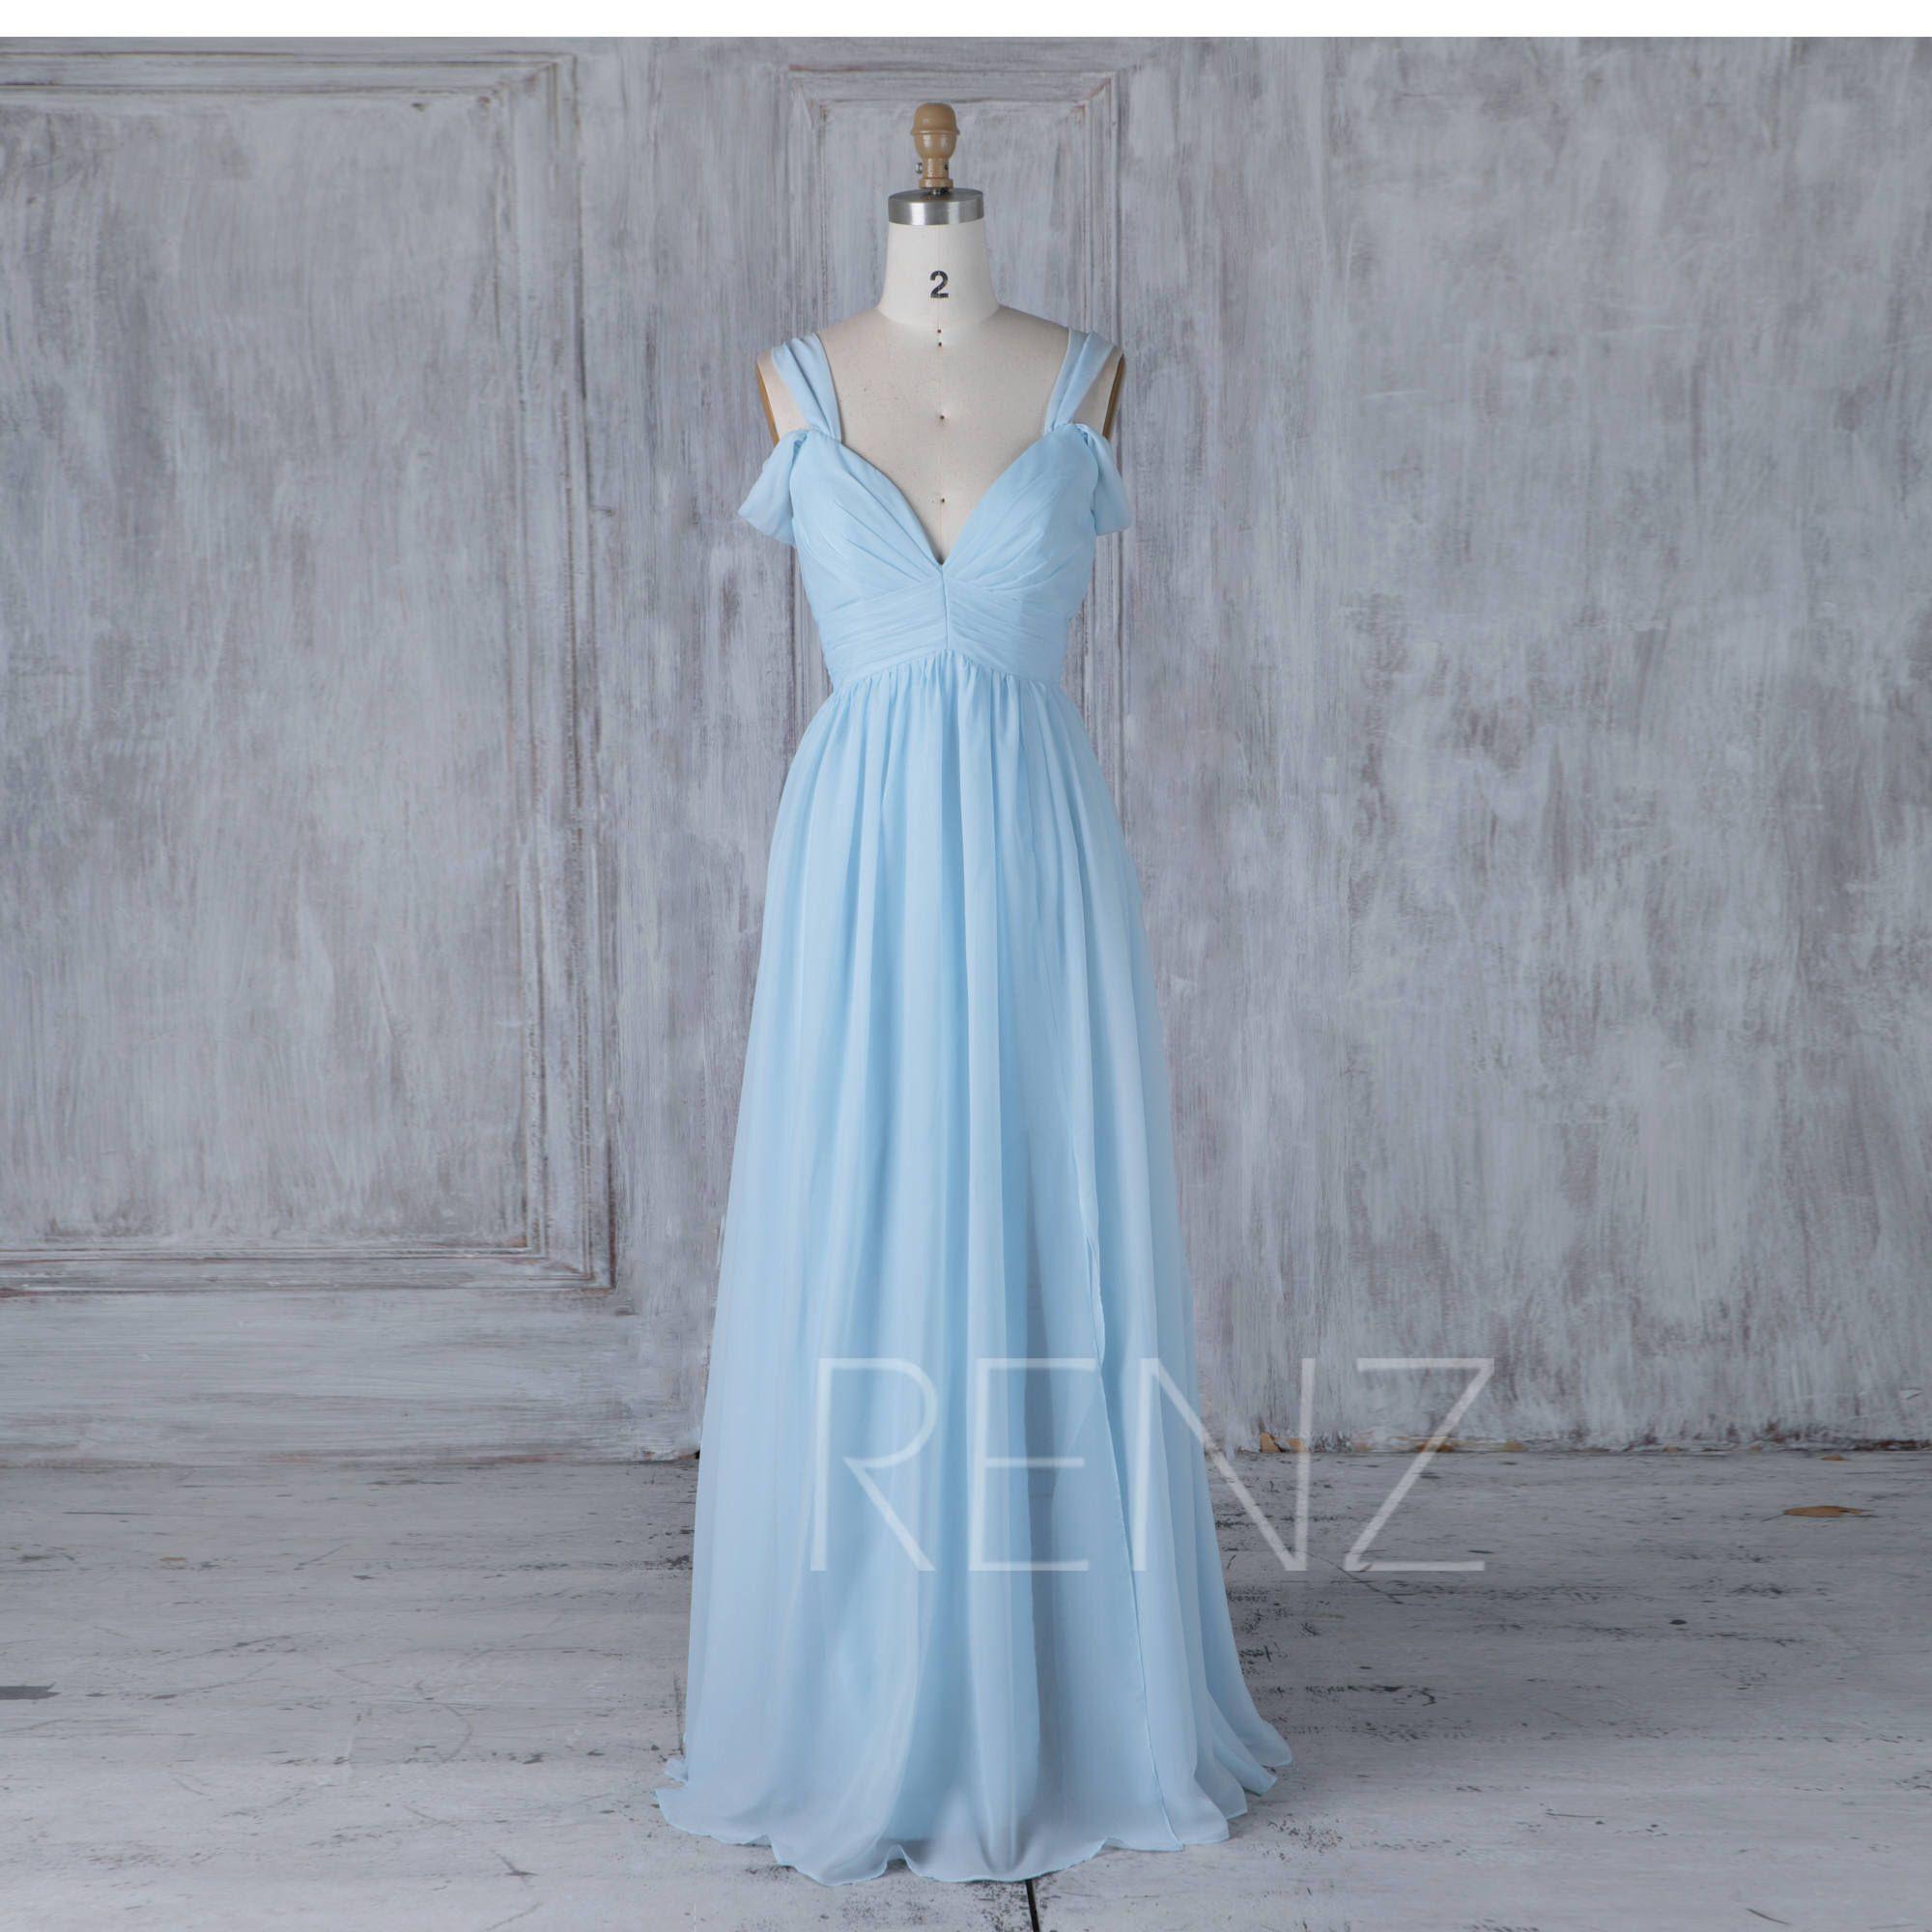 Bridesmaid Dress Light Blue V Neck Chiffon Wedding Dress Off Shoulder Sleeves Long Prom D Chiffon Party Dress Baby Blue Bridesmaid Dresses Blue Chiffon Dresses